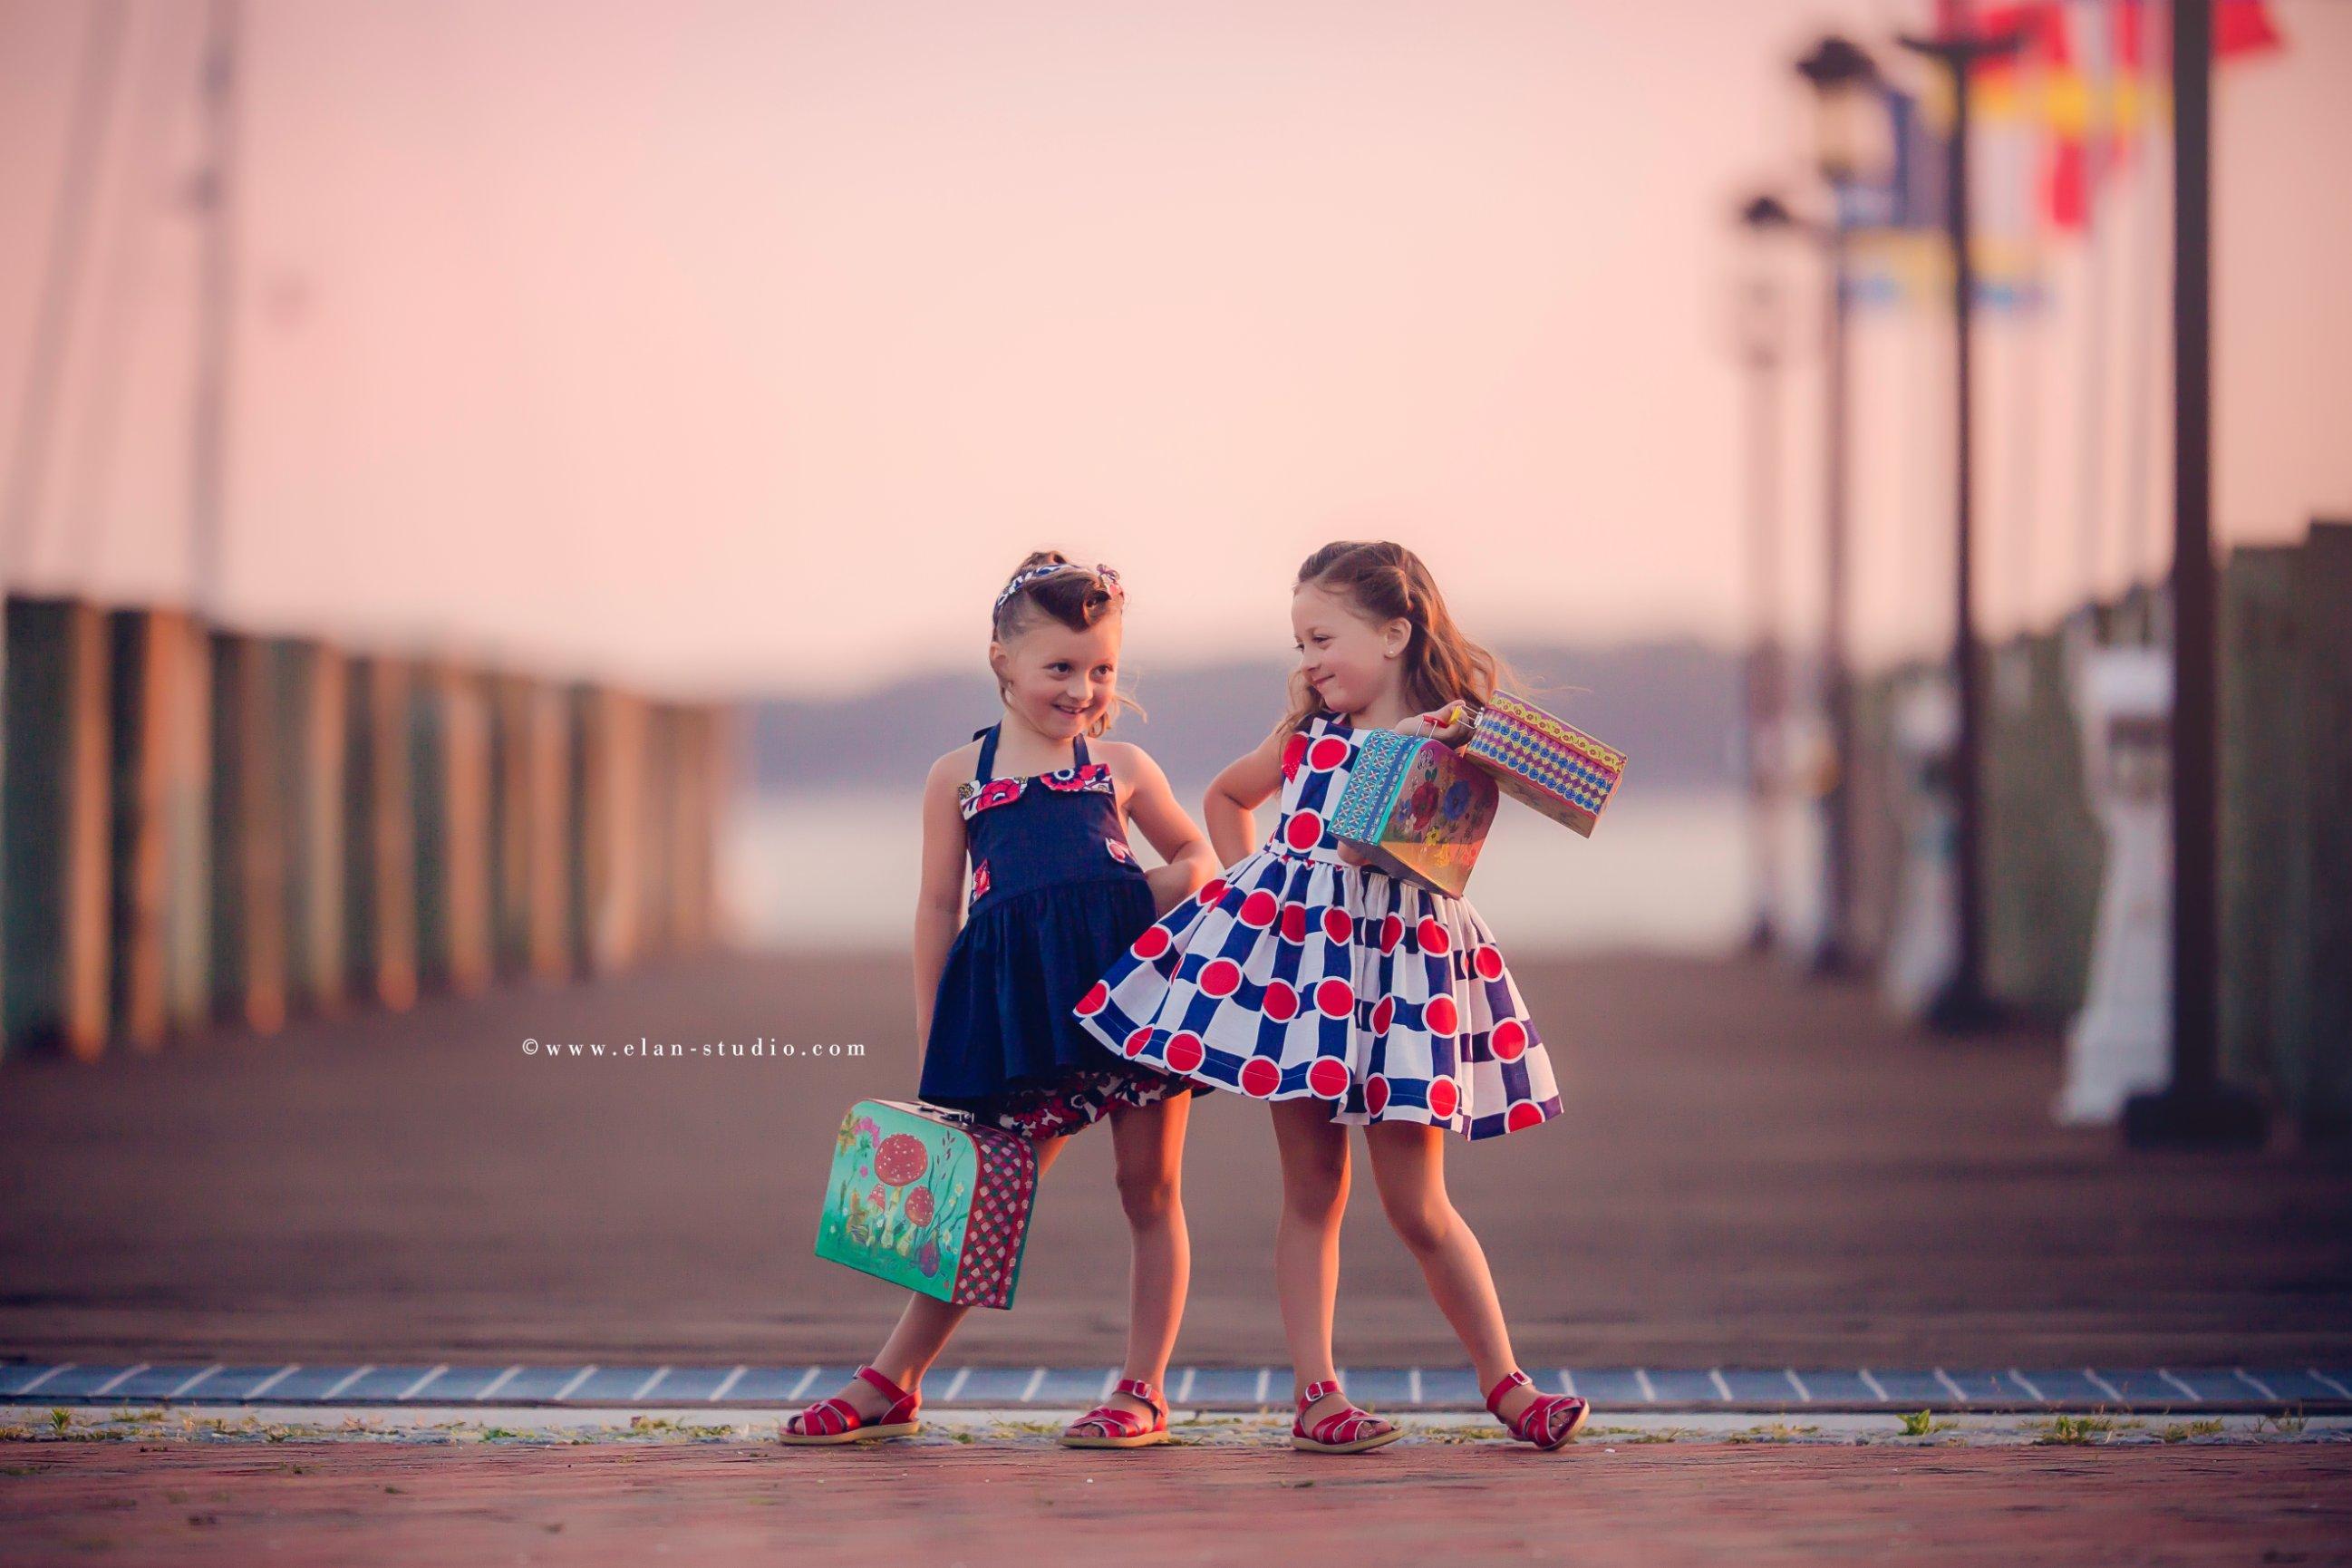 vintage beach photoshoot, two sisters, victory rolls hair, vintage girls dresses